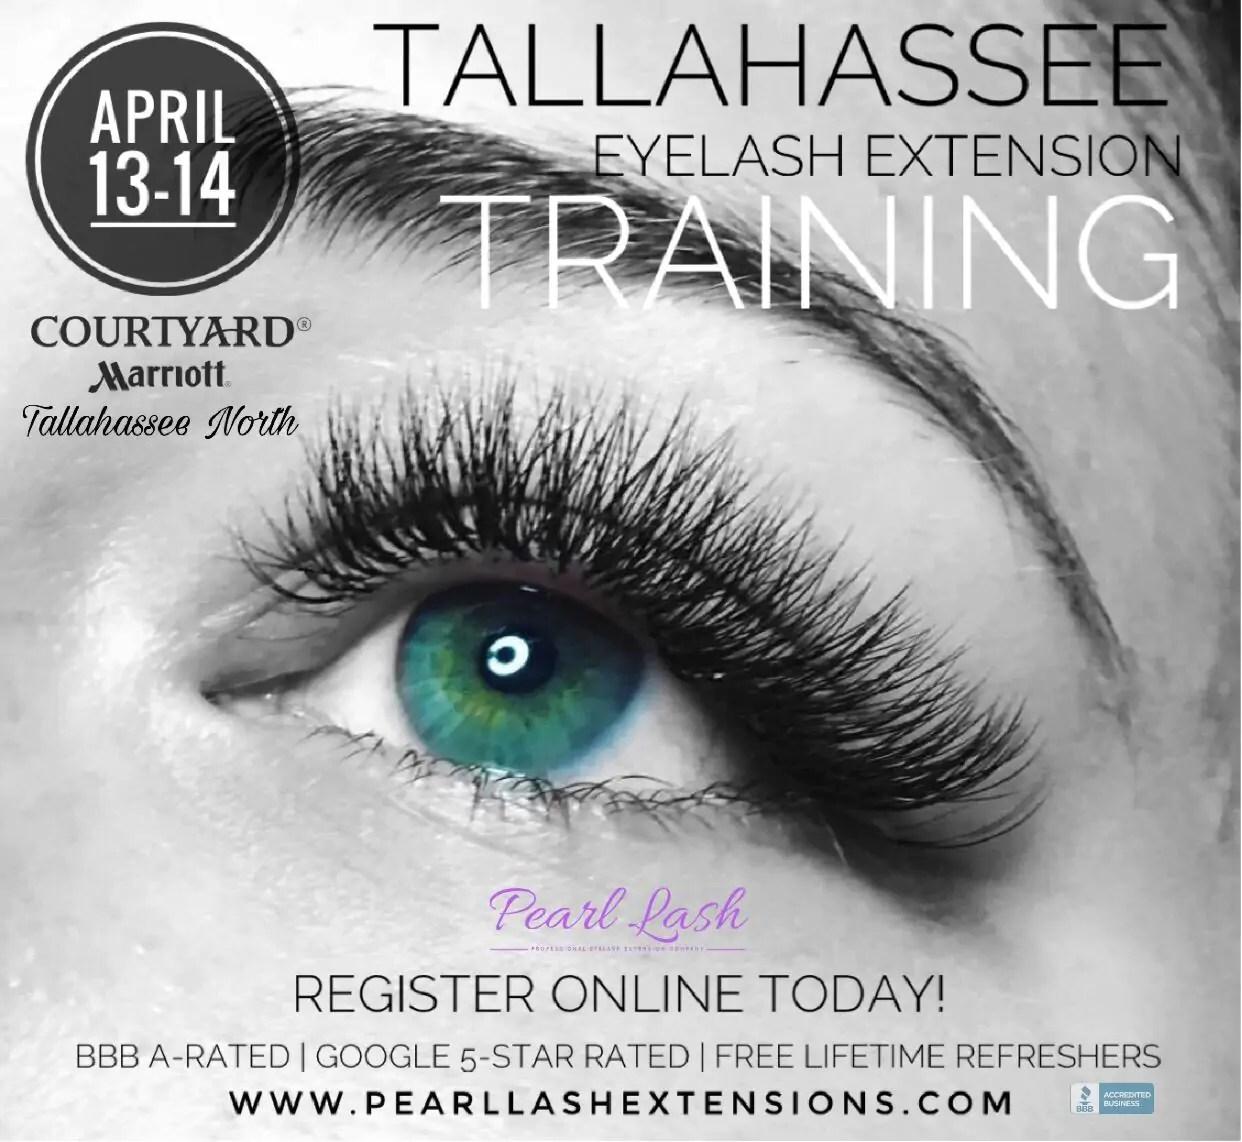 d468306bca6 Tallahassee Eyelash Extension Classic Training Class April 13 ...